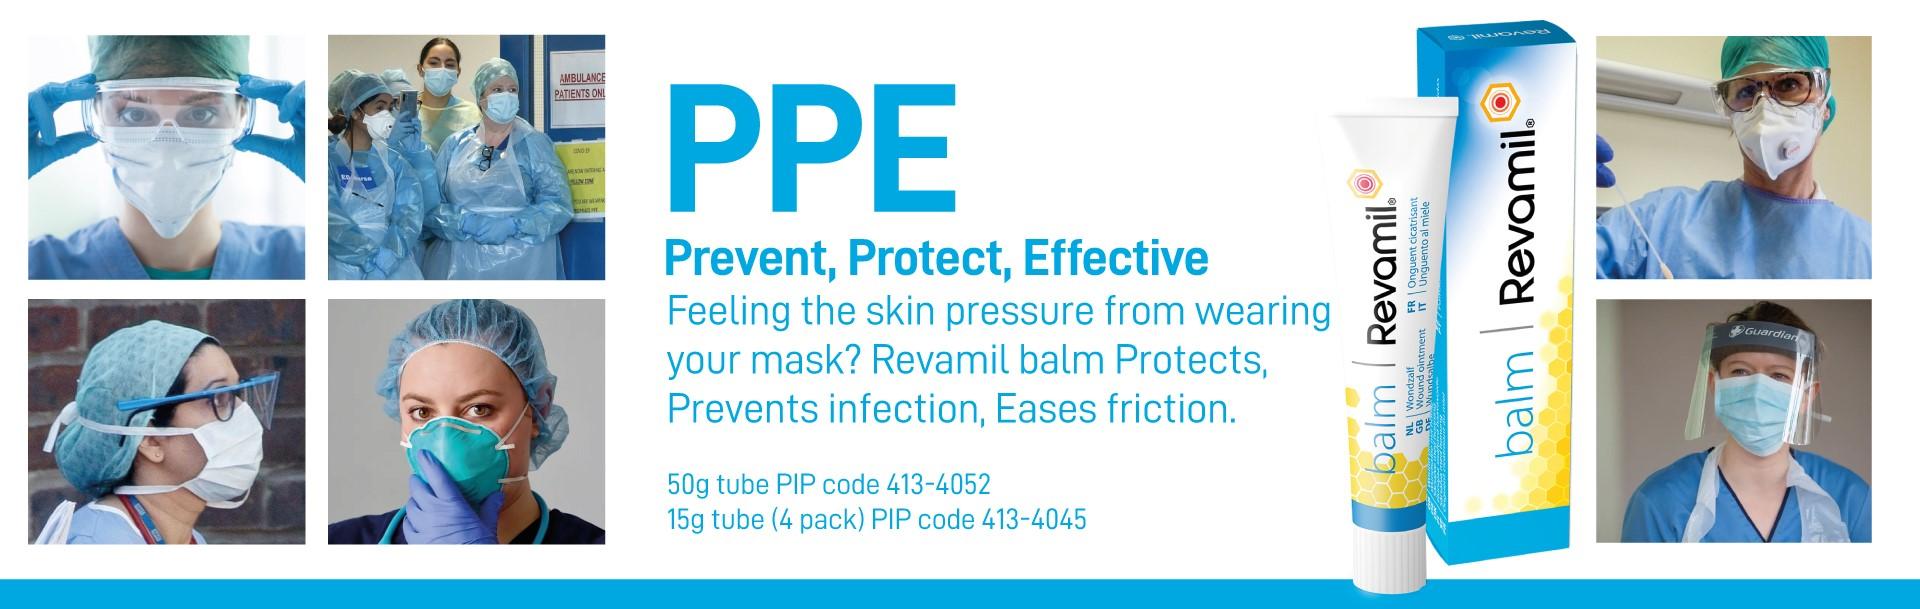 Revamil Balm - PPE